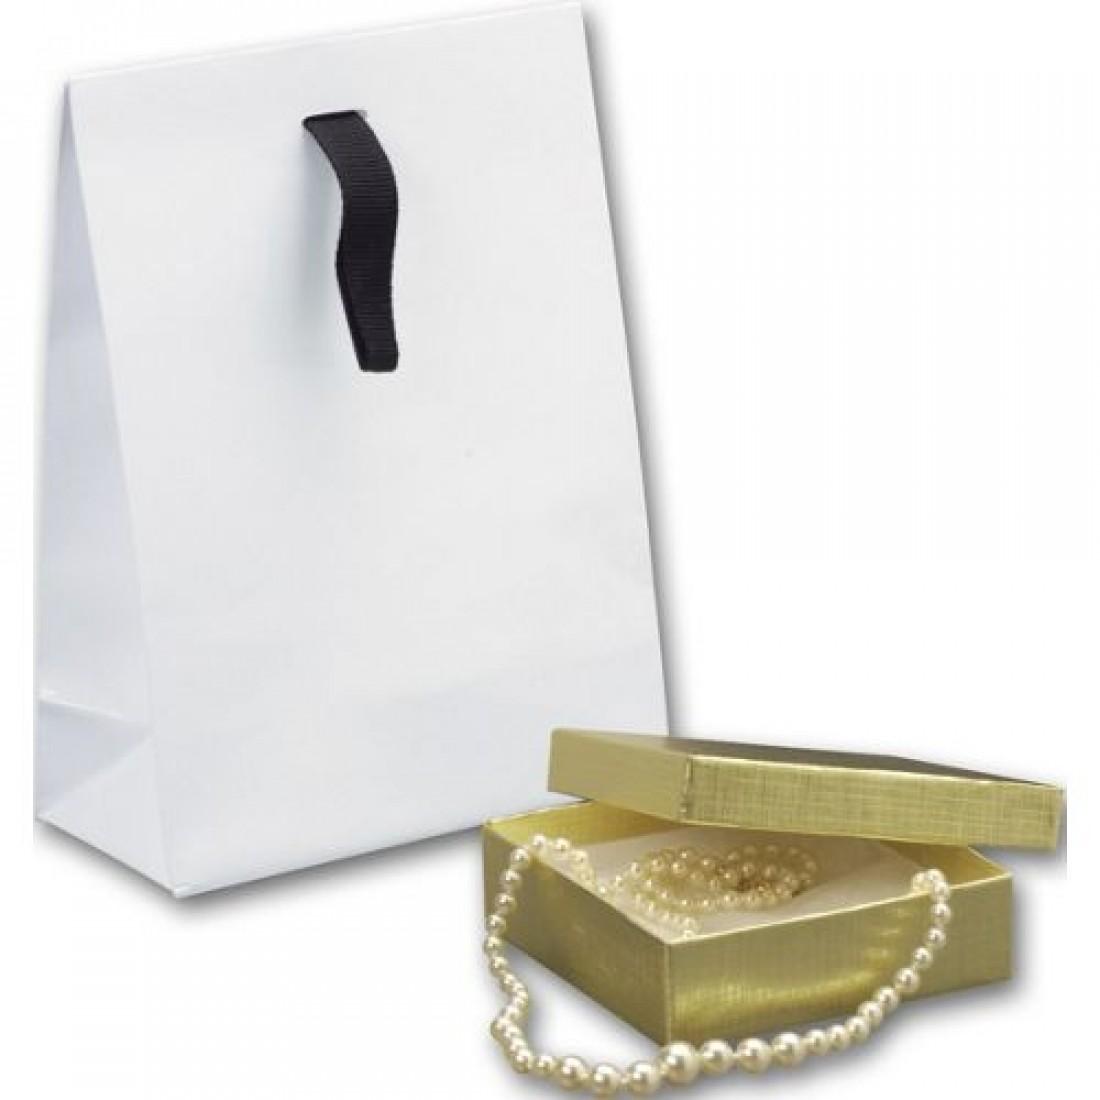 White Gloss Gift Euro Bag